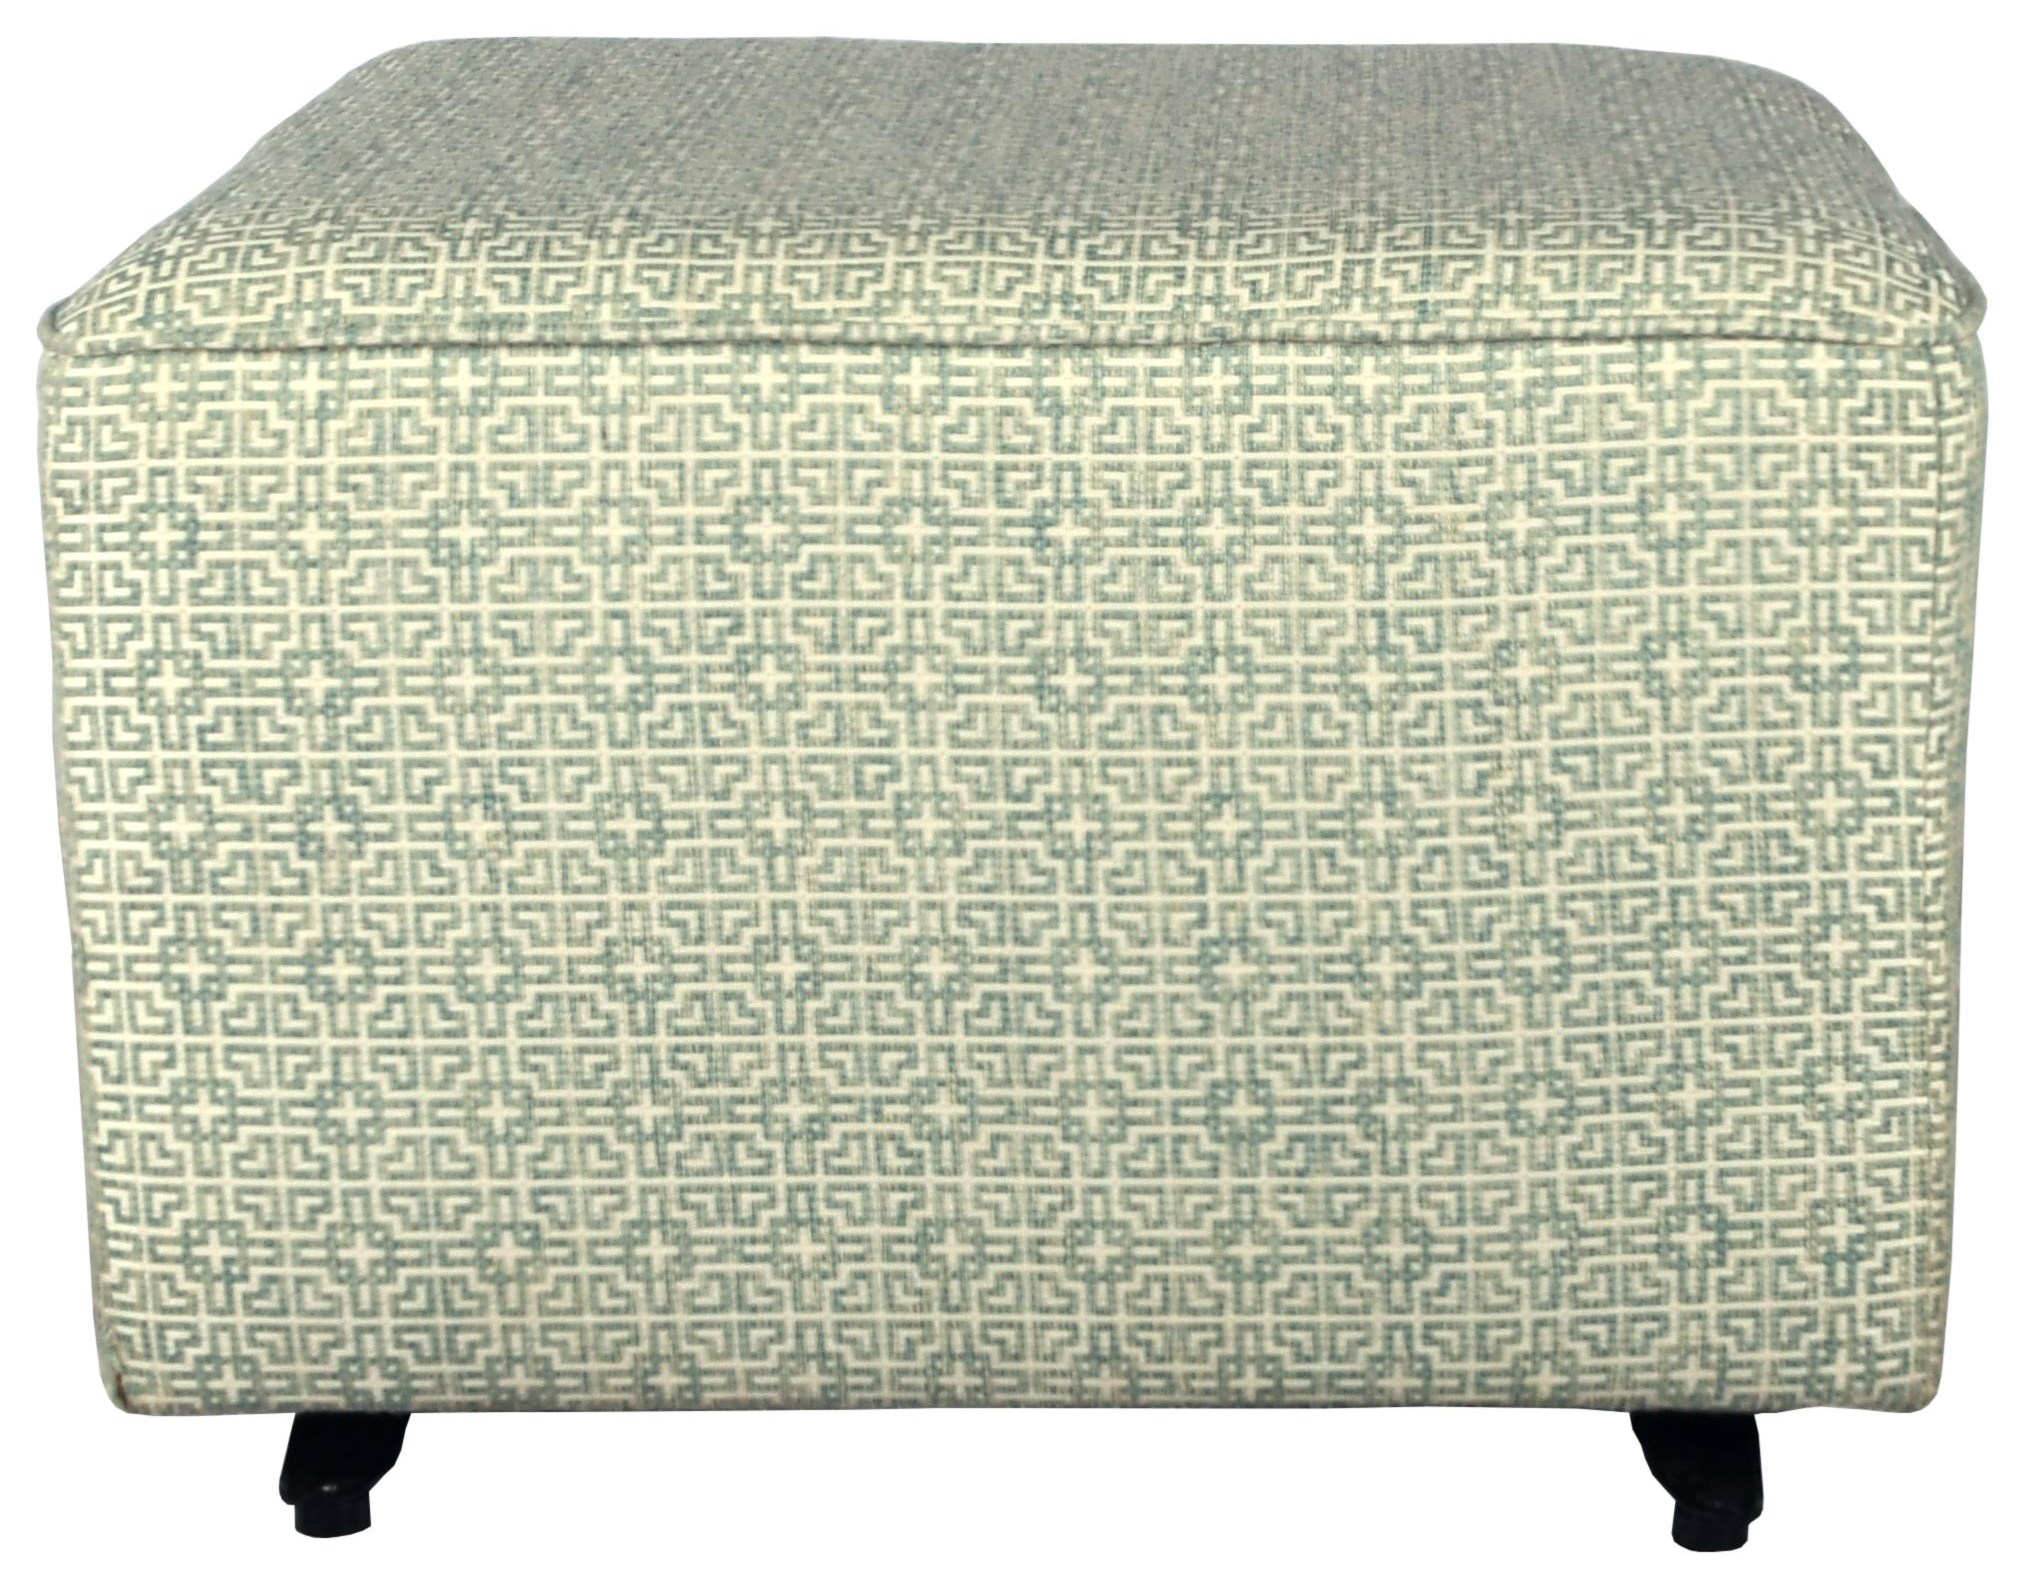 Kacey Ottoman W/ Glider Base by Bravo Furniture at Bennett's Furniture and Mattresses